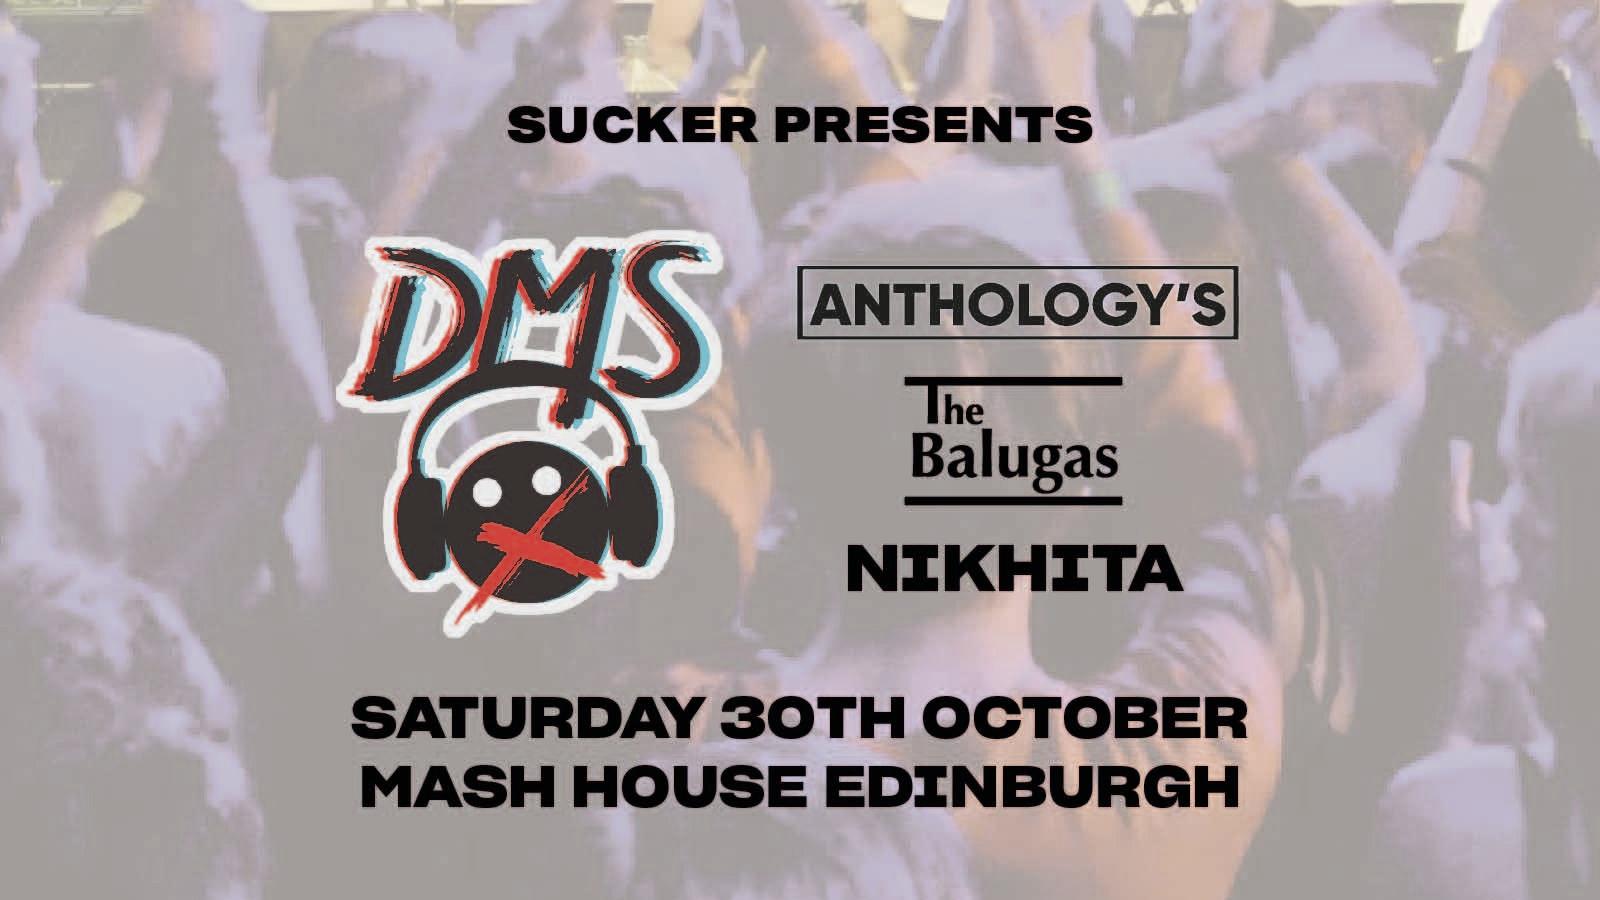 Sucker Presents: DMS, The Anthology's, The Balugas, Nikhita